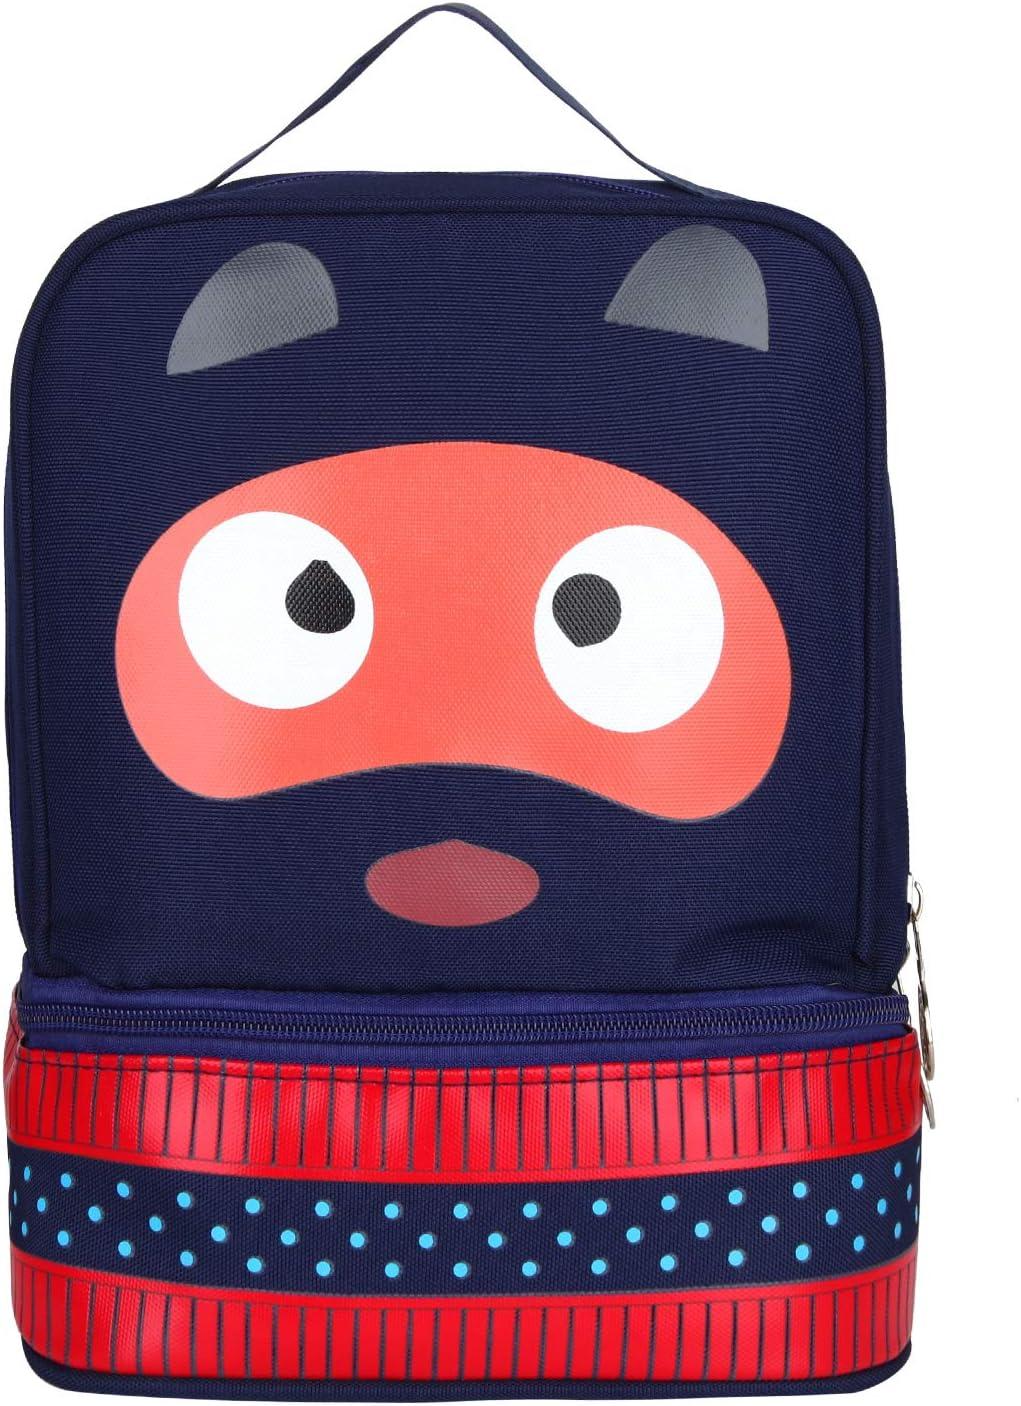 Mochila para niños Niñas, Animal de Dibujos Animados Mini Bolsa de Viaje Loncheras preescolares Bolsa de Transporte para bebé (Azul Oscuro)